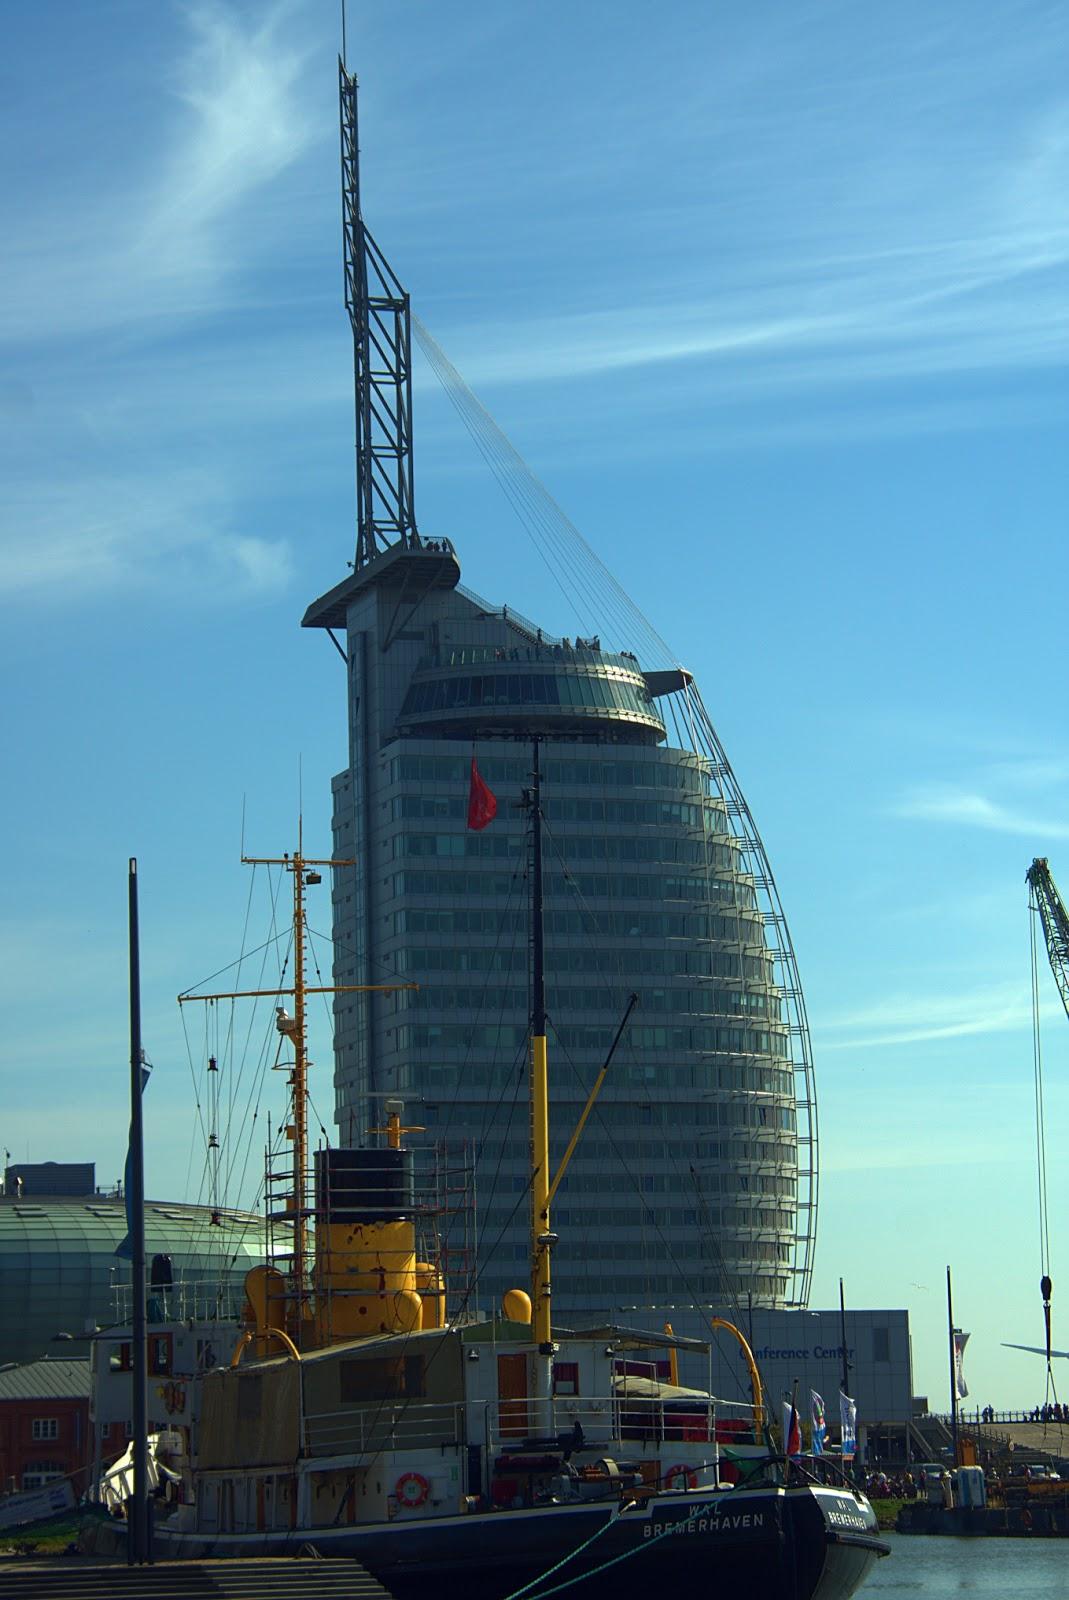 #274 Kiron Macro f3.8-f5.6 28-210mm – 1€ Projekt – Havenwelten Bremerhaven Klimahaus